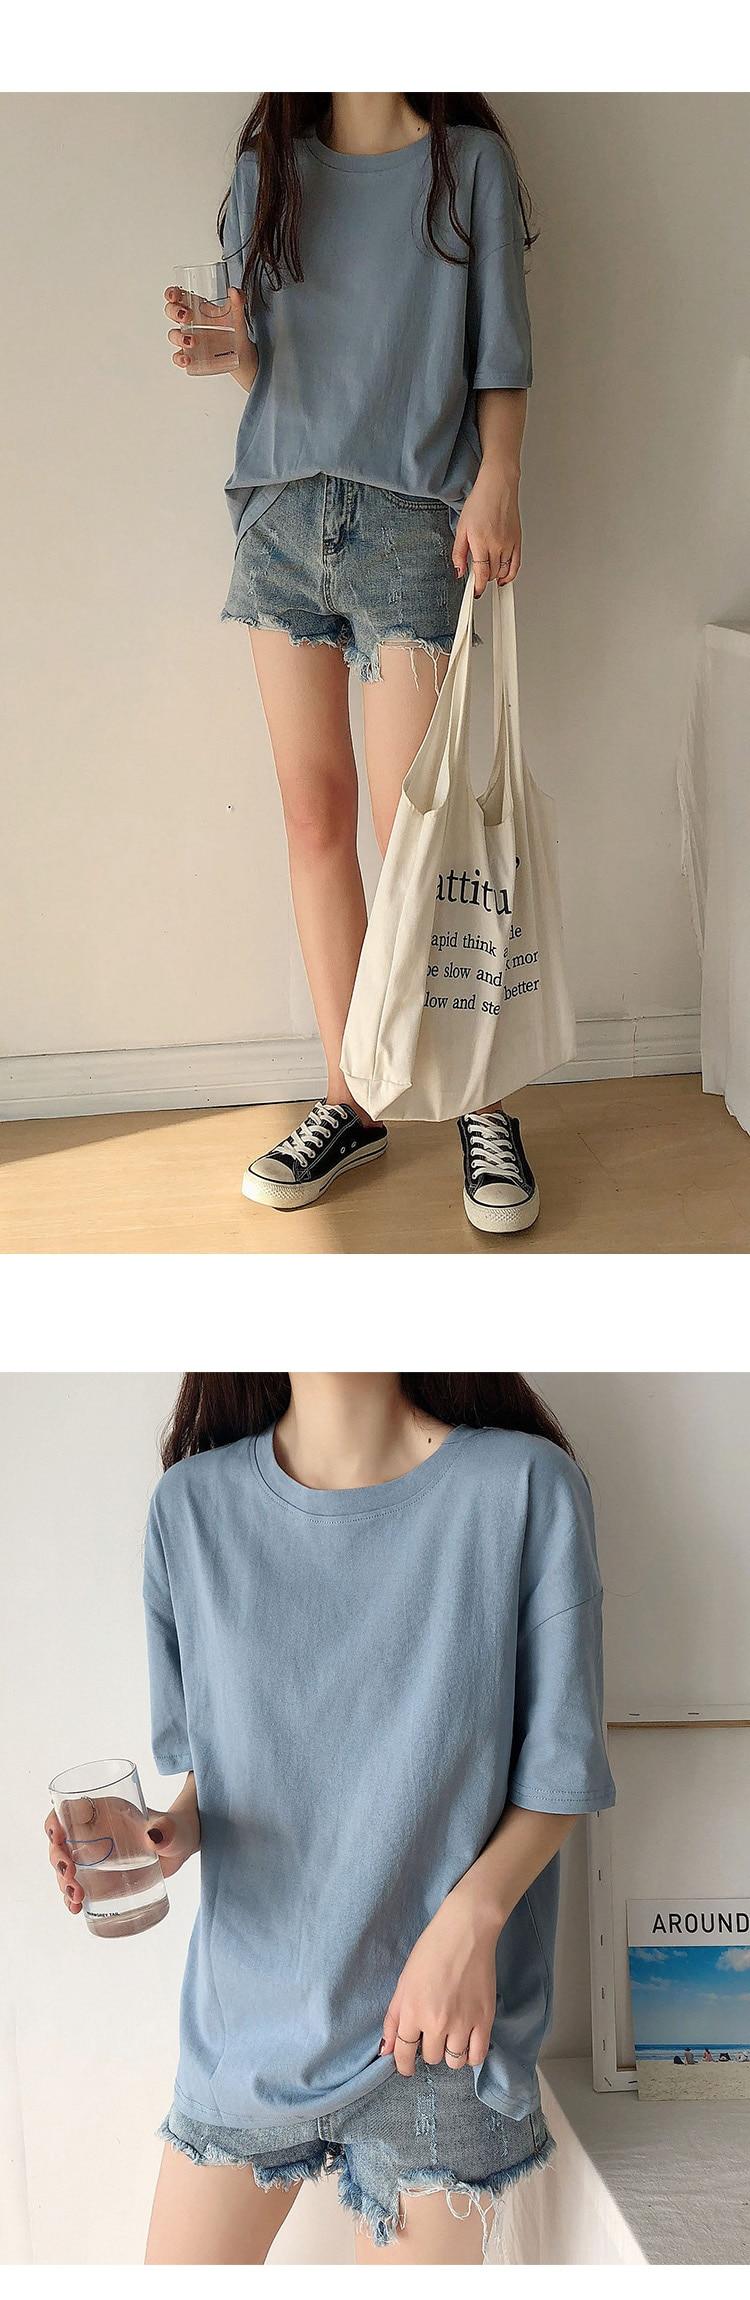 H53ebe4c0f64e4c369a2cb3a625a684a1N - Summer O-Neck Short Sleeves Minimalist Loose Basic T-Shirt